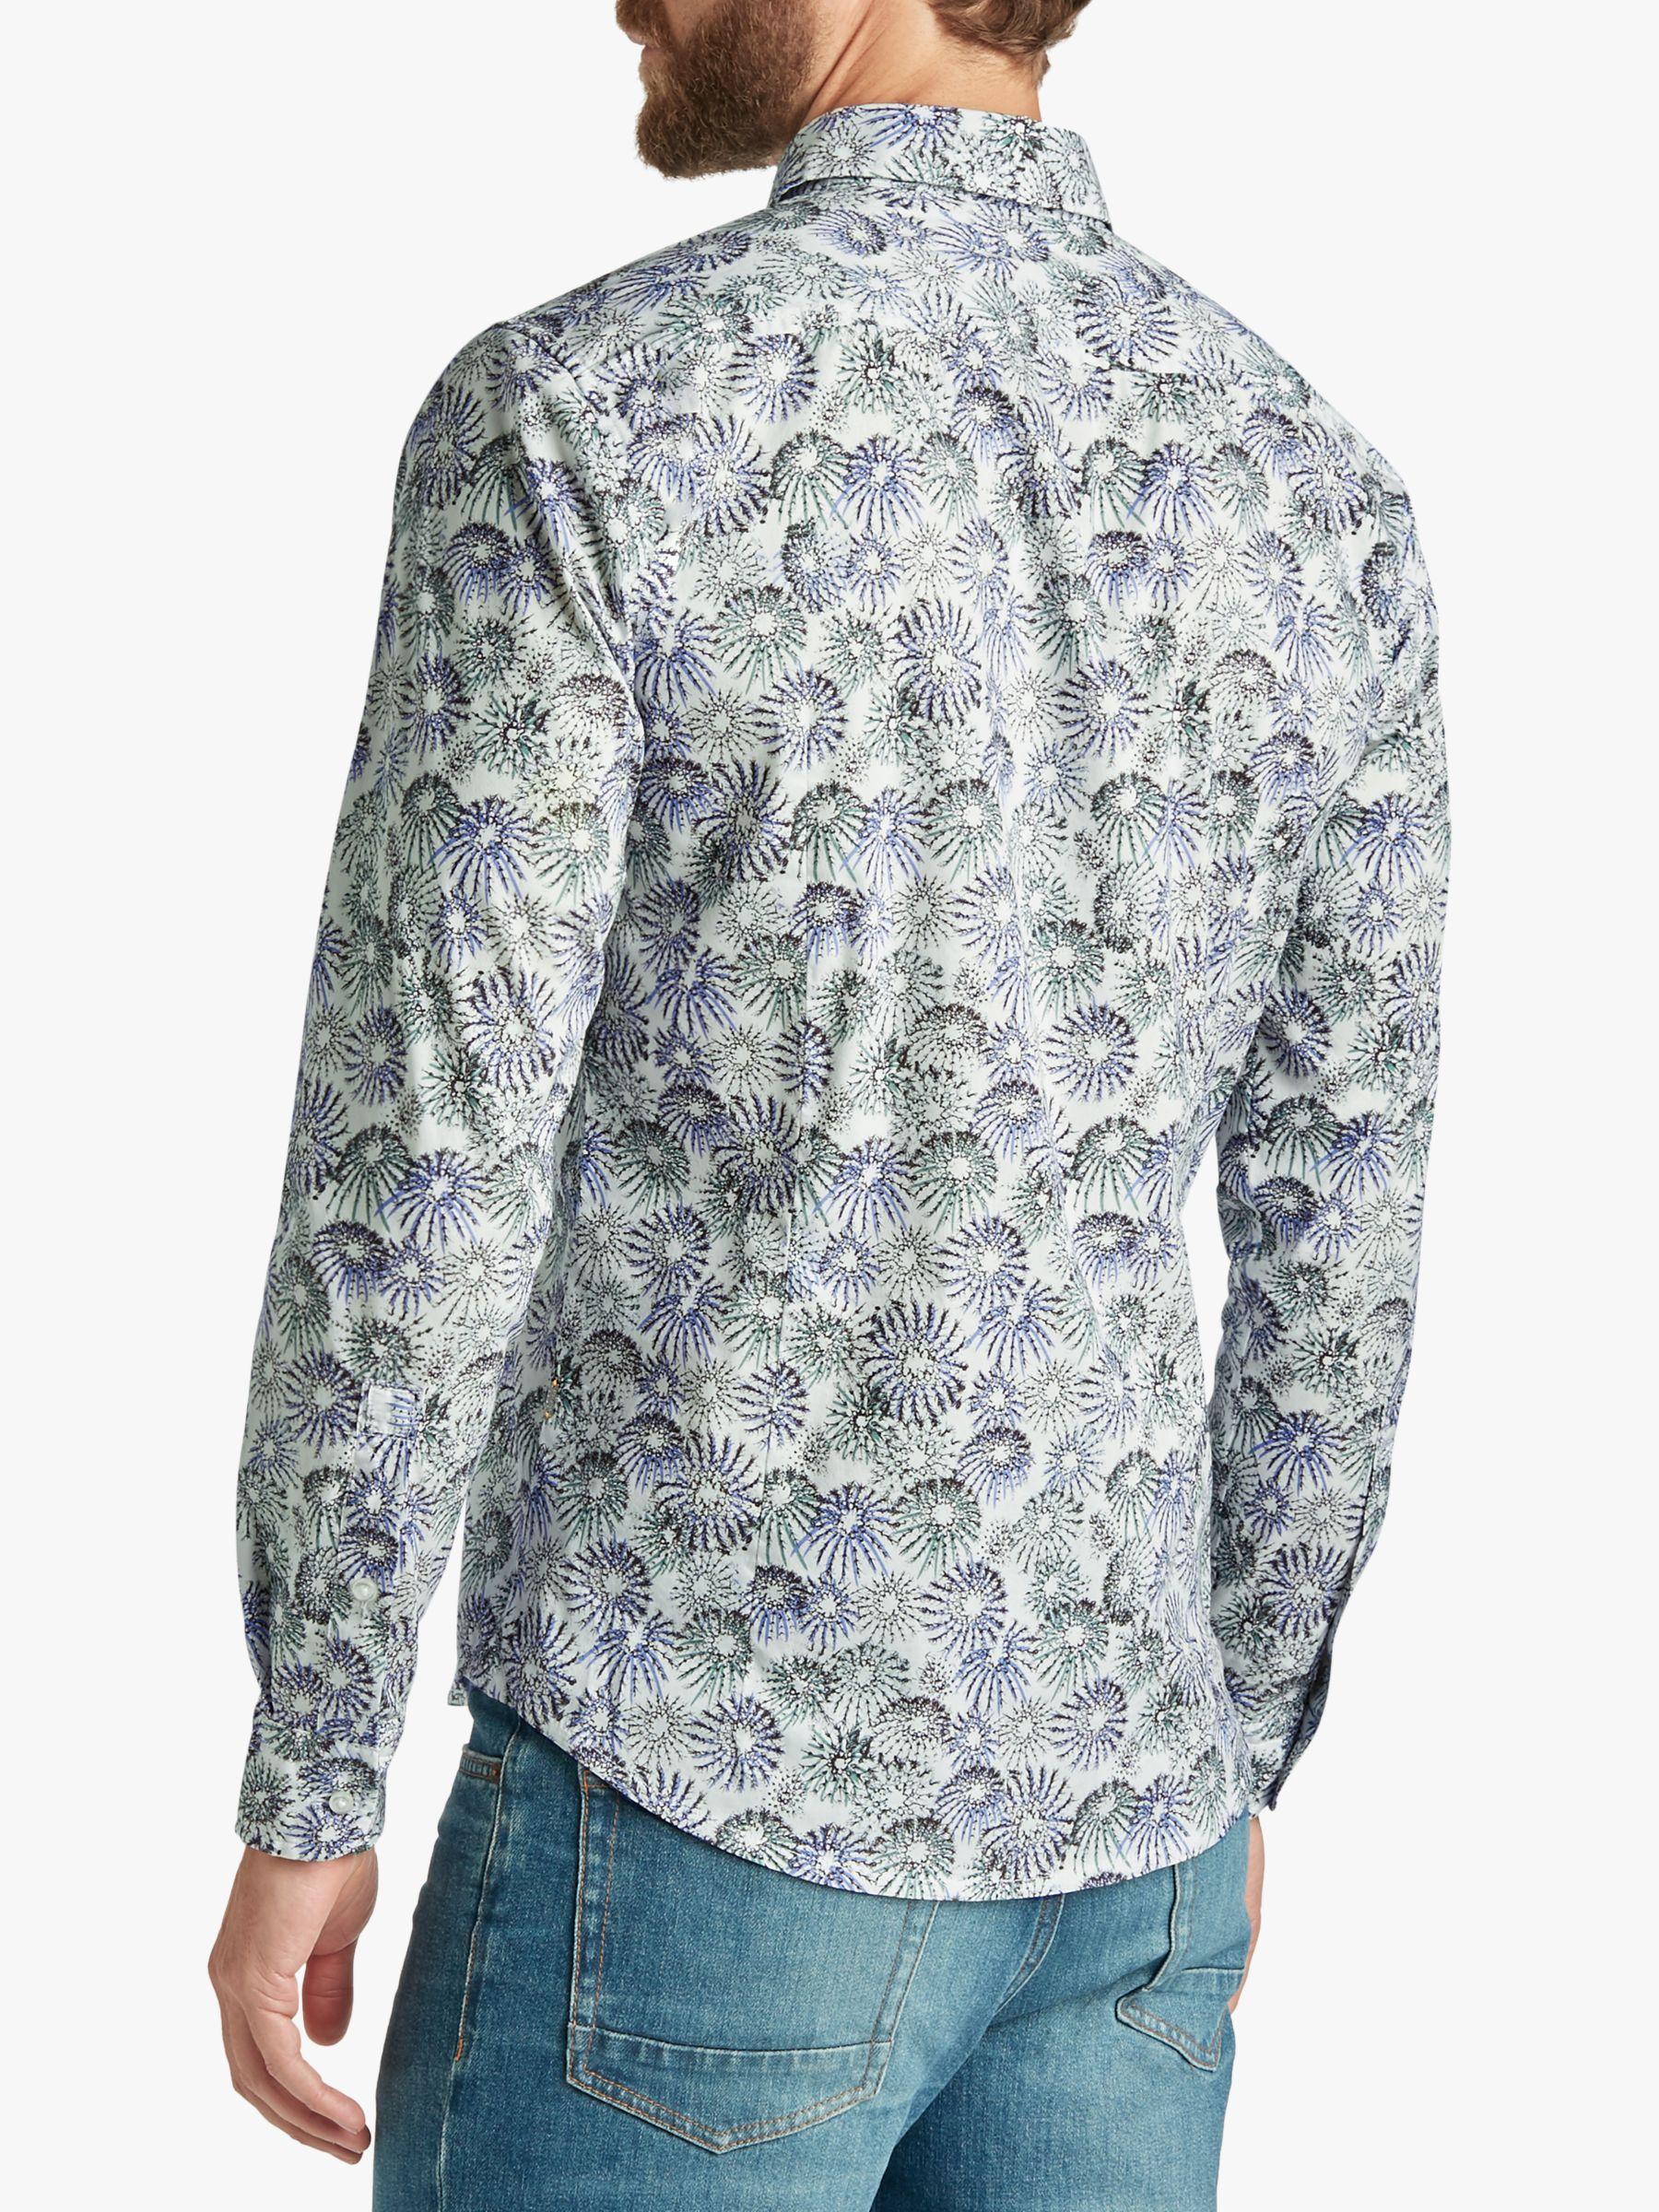 afb7f9ff7 BOSS Boss Mypop Print Slim Fit Shirt in White for Men - Lyst